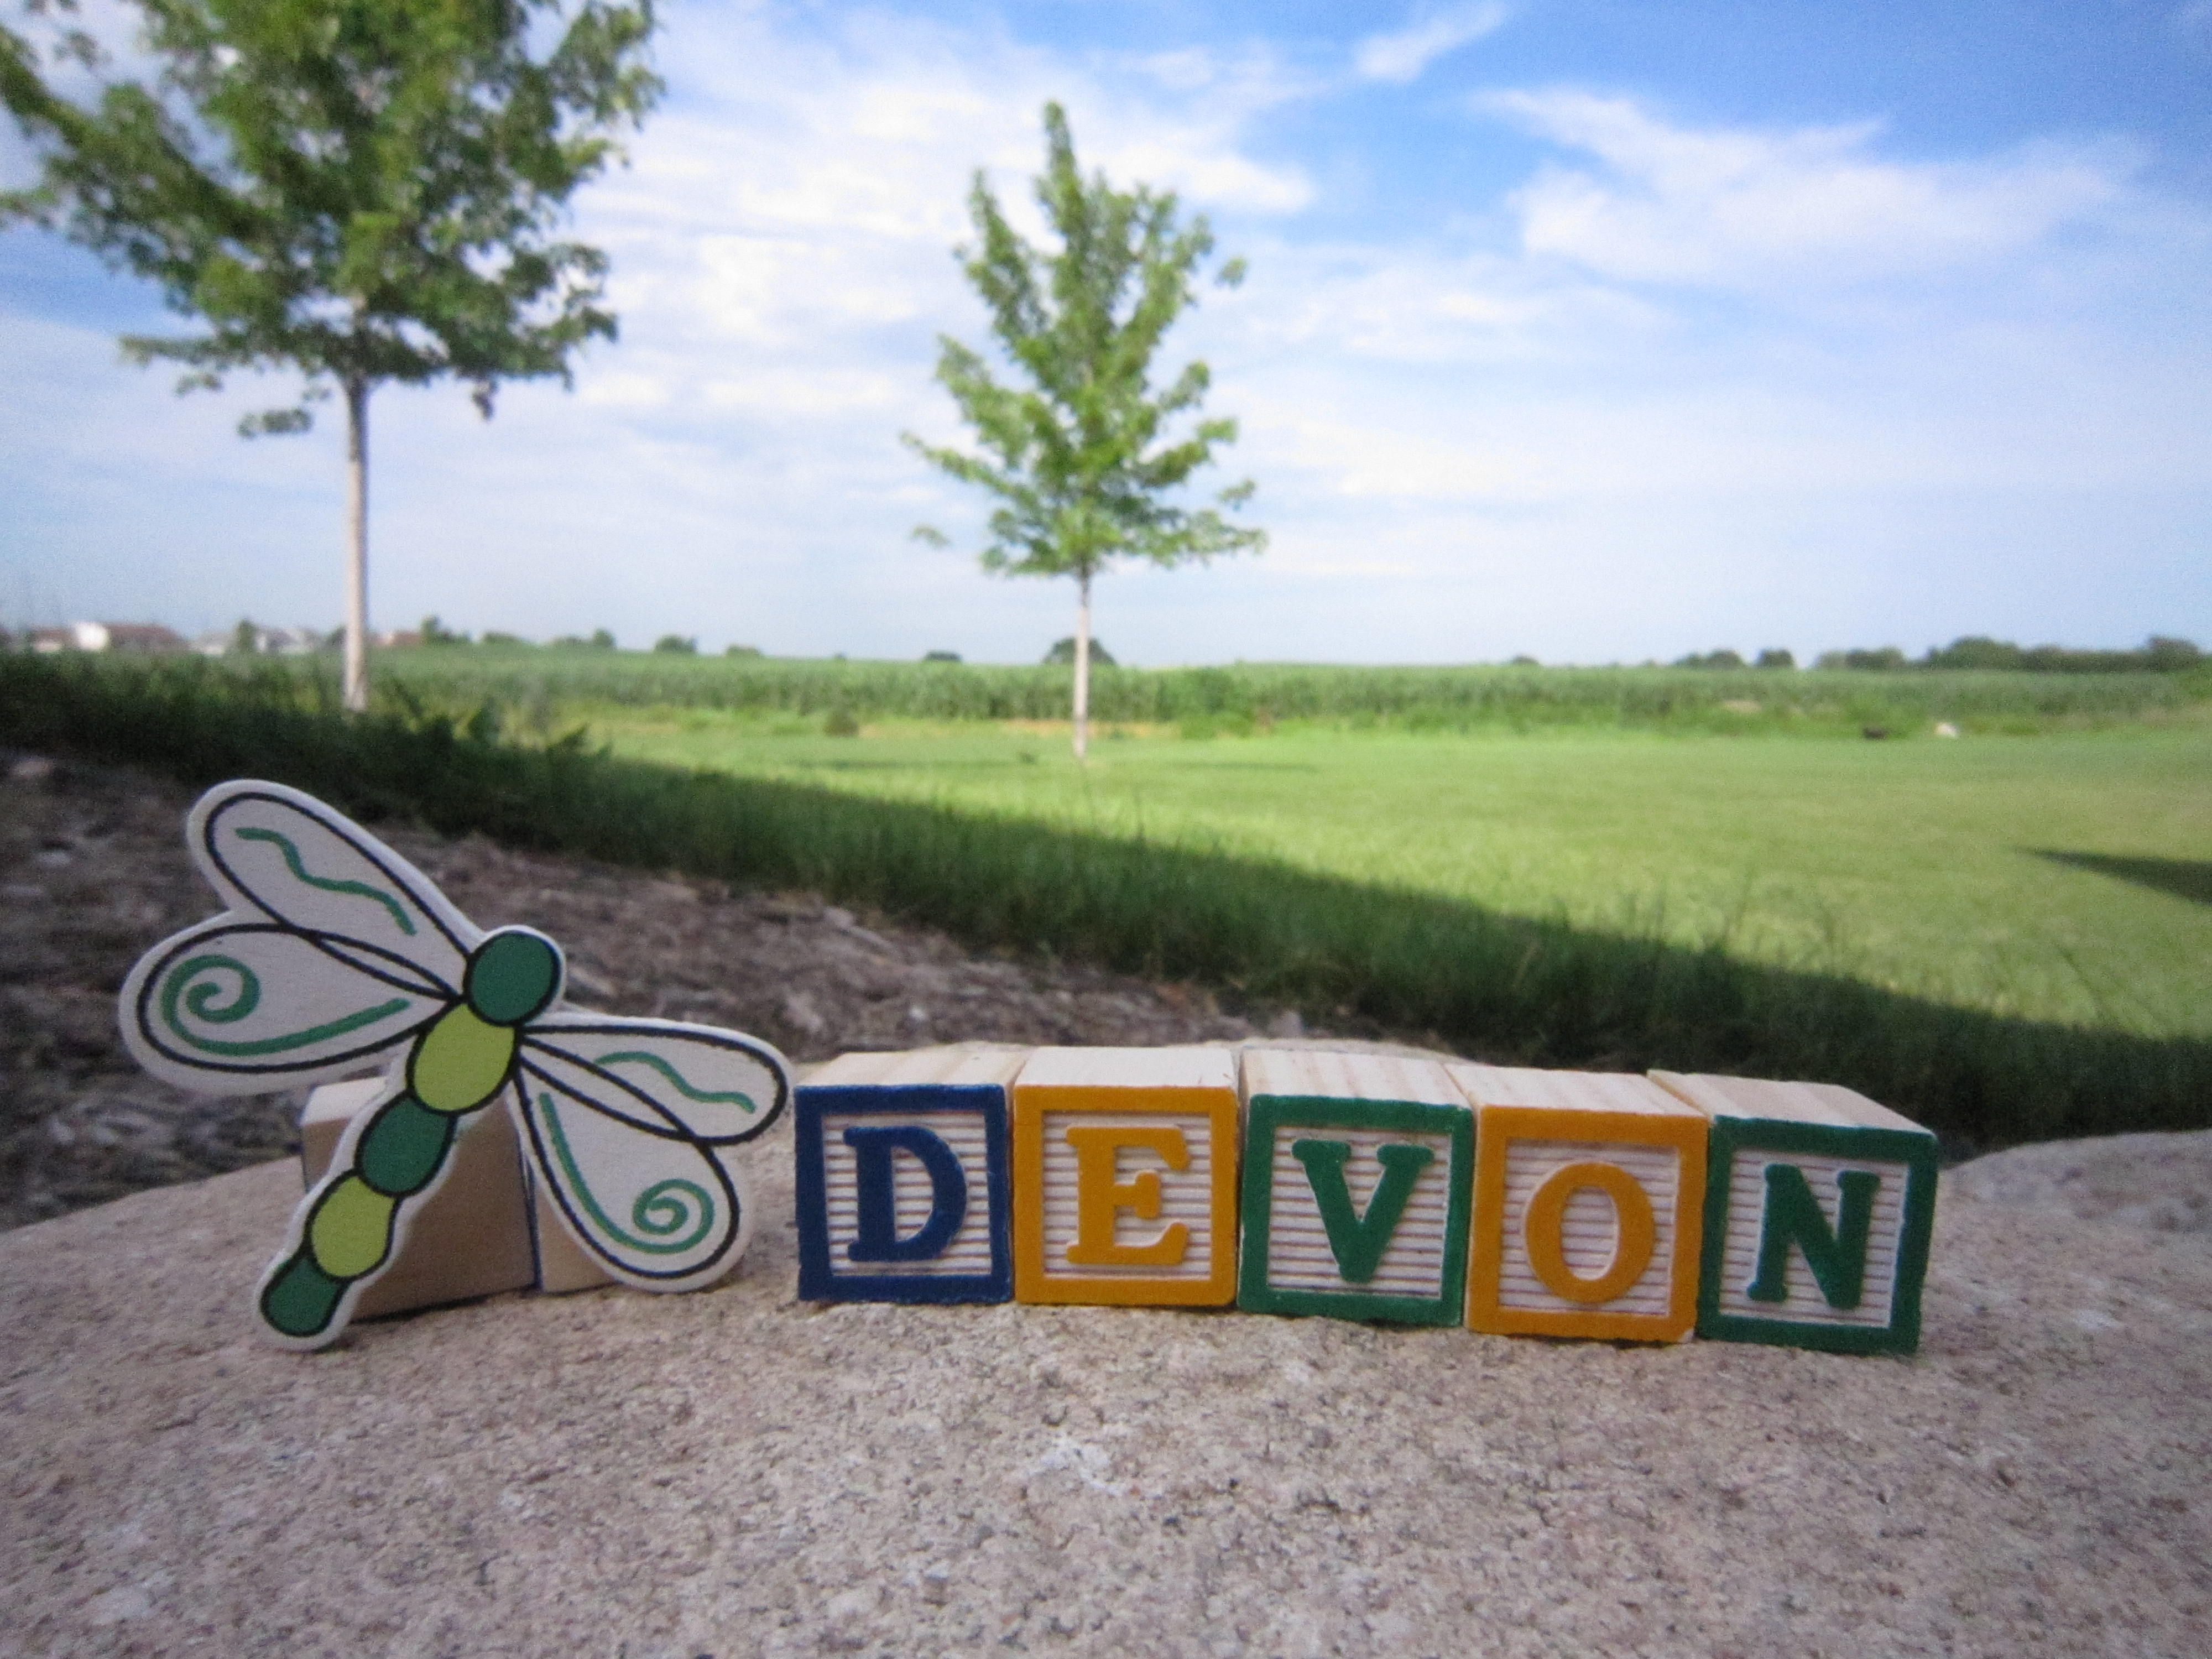 Nephew...Devon (With images)   Baby names, Baby angel, Devon